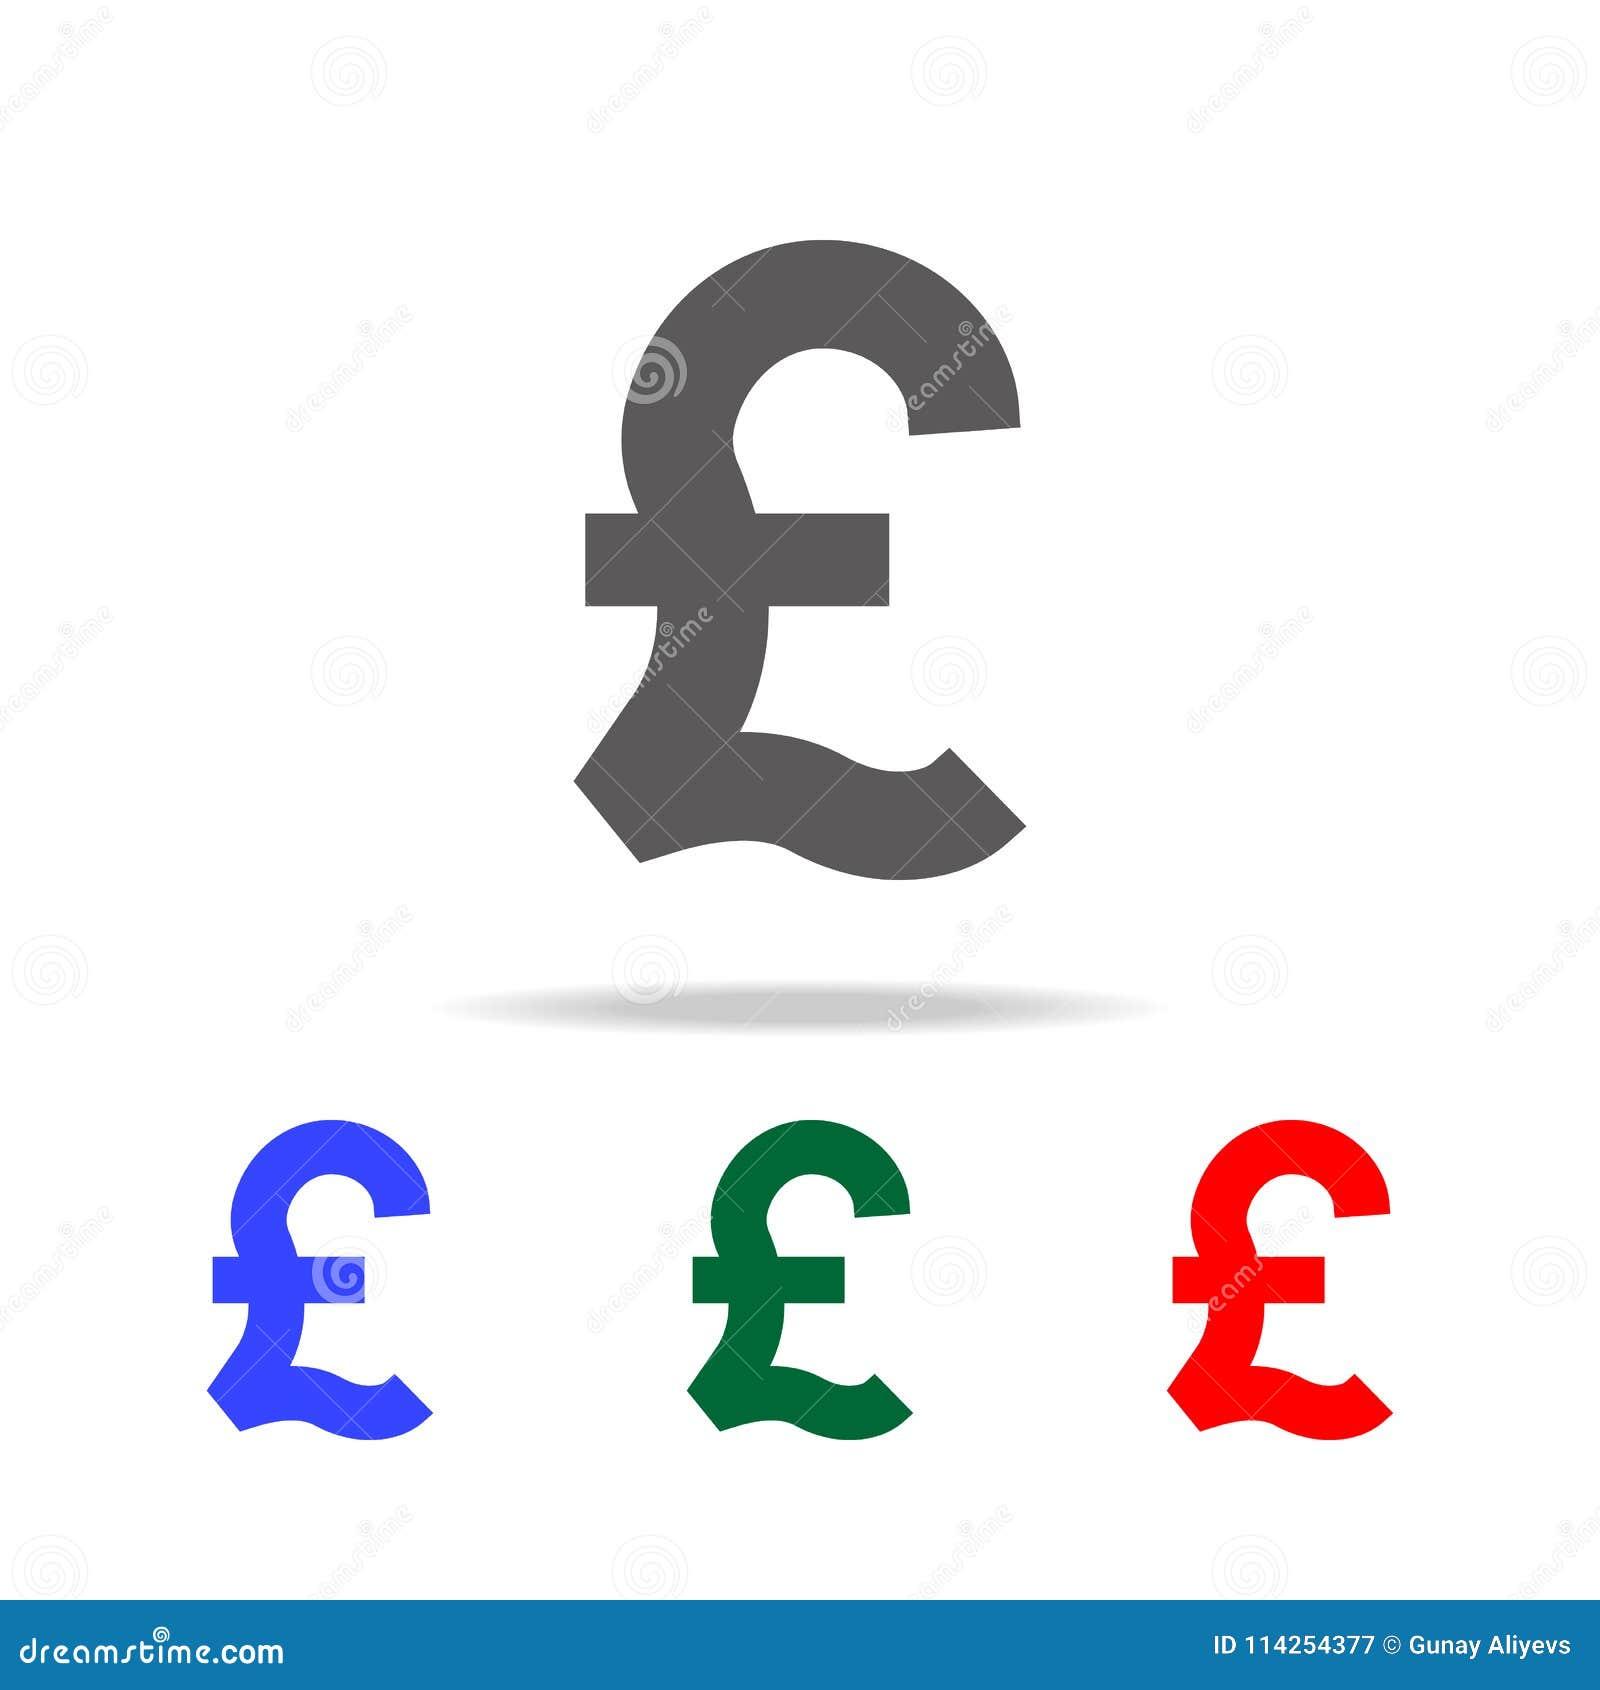 Pound Symbol Icon Elements Of United Kingdom Multi Colored Icons